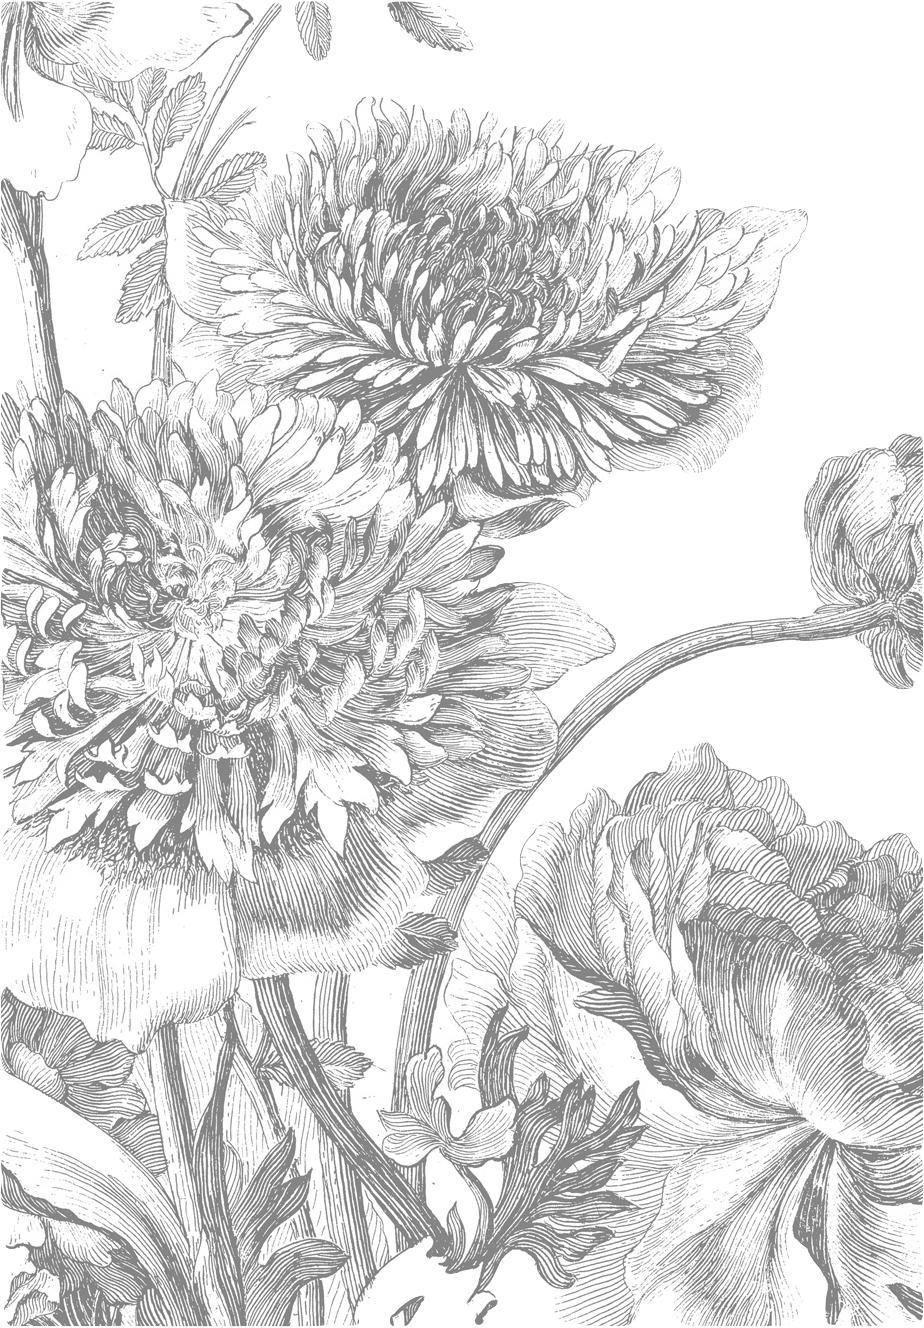 Fotomural Engraved Flowers, Tejido no tejido, ecológica y biodegradable, Gris, blanco, An 195 x Al 280 cm